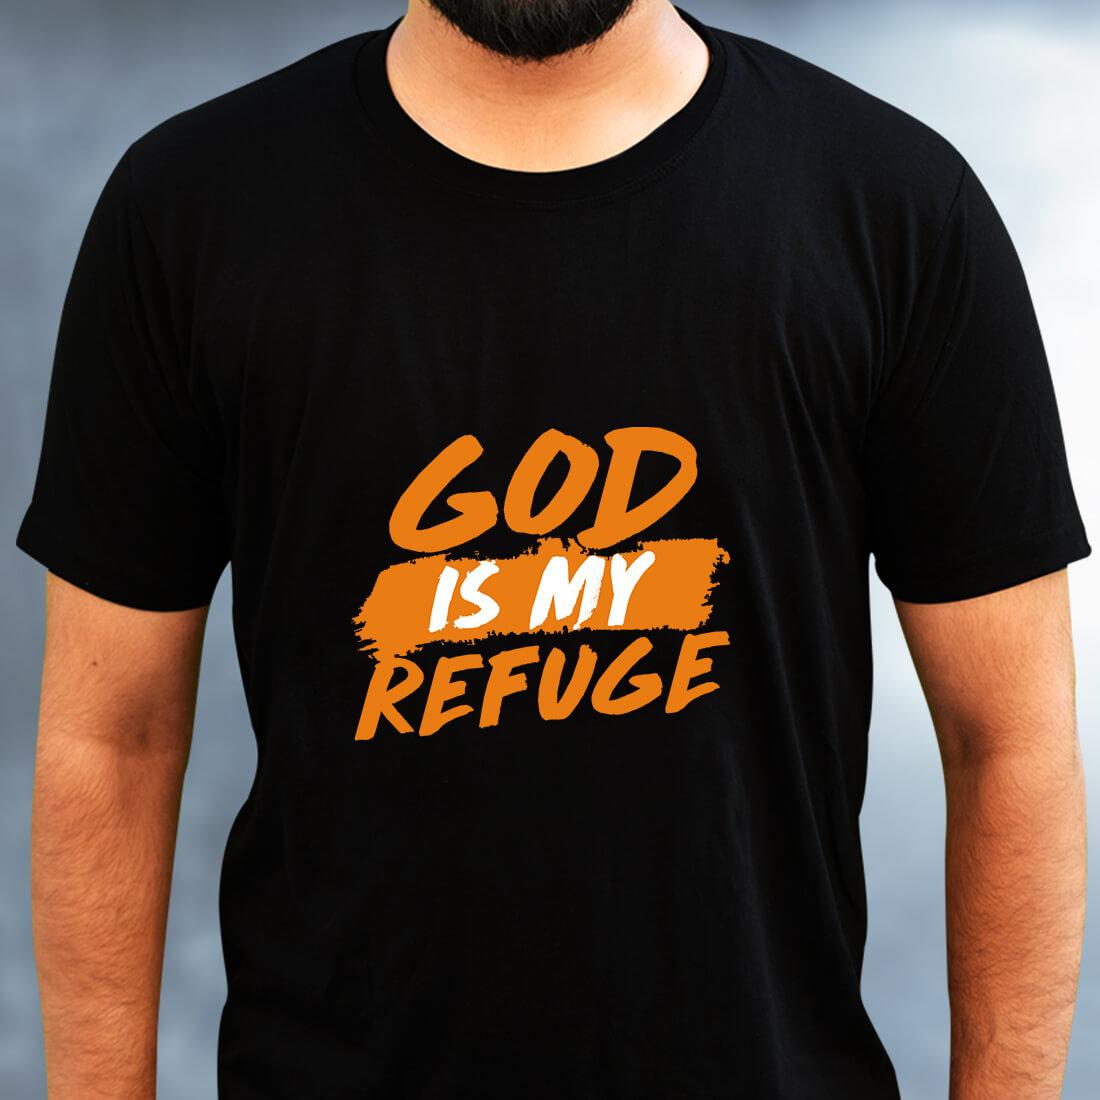 God is My Refuge Printed Plain Black T Shirt Mens